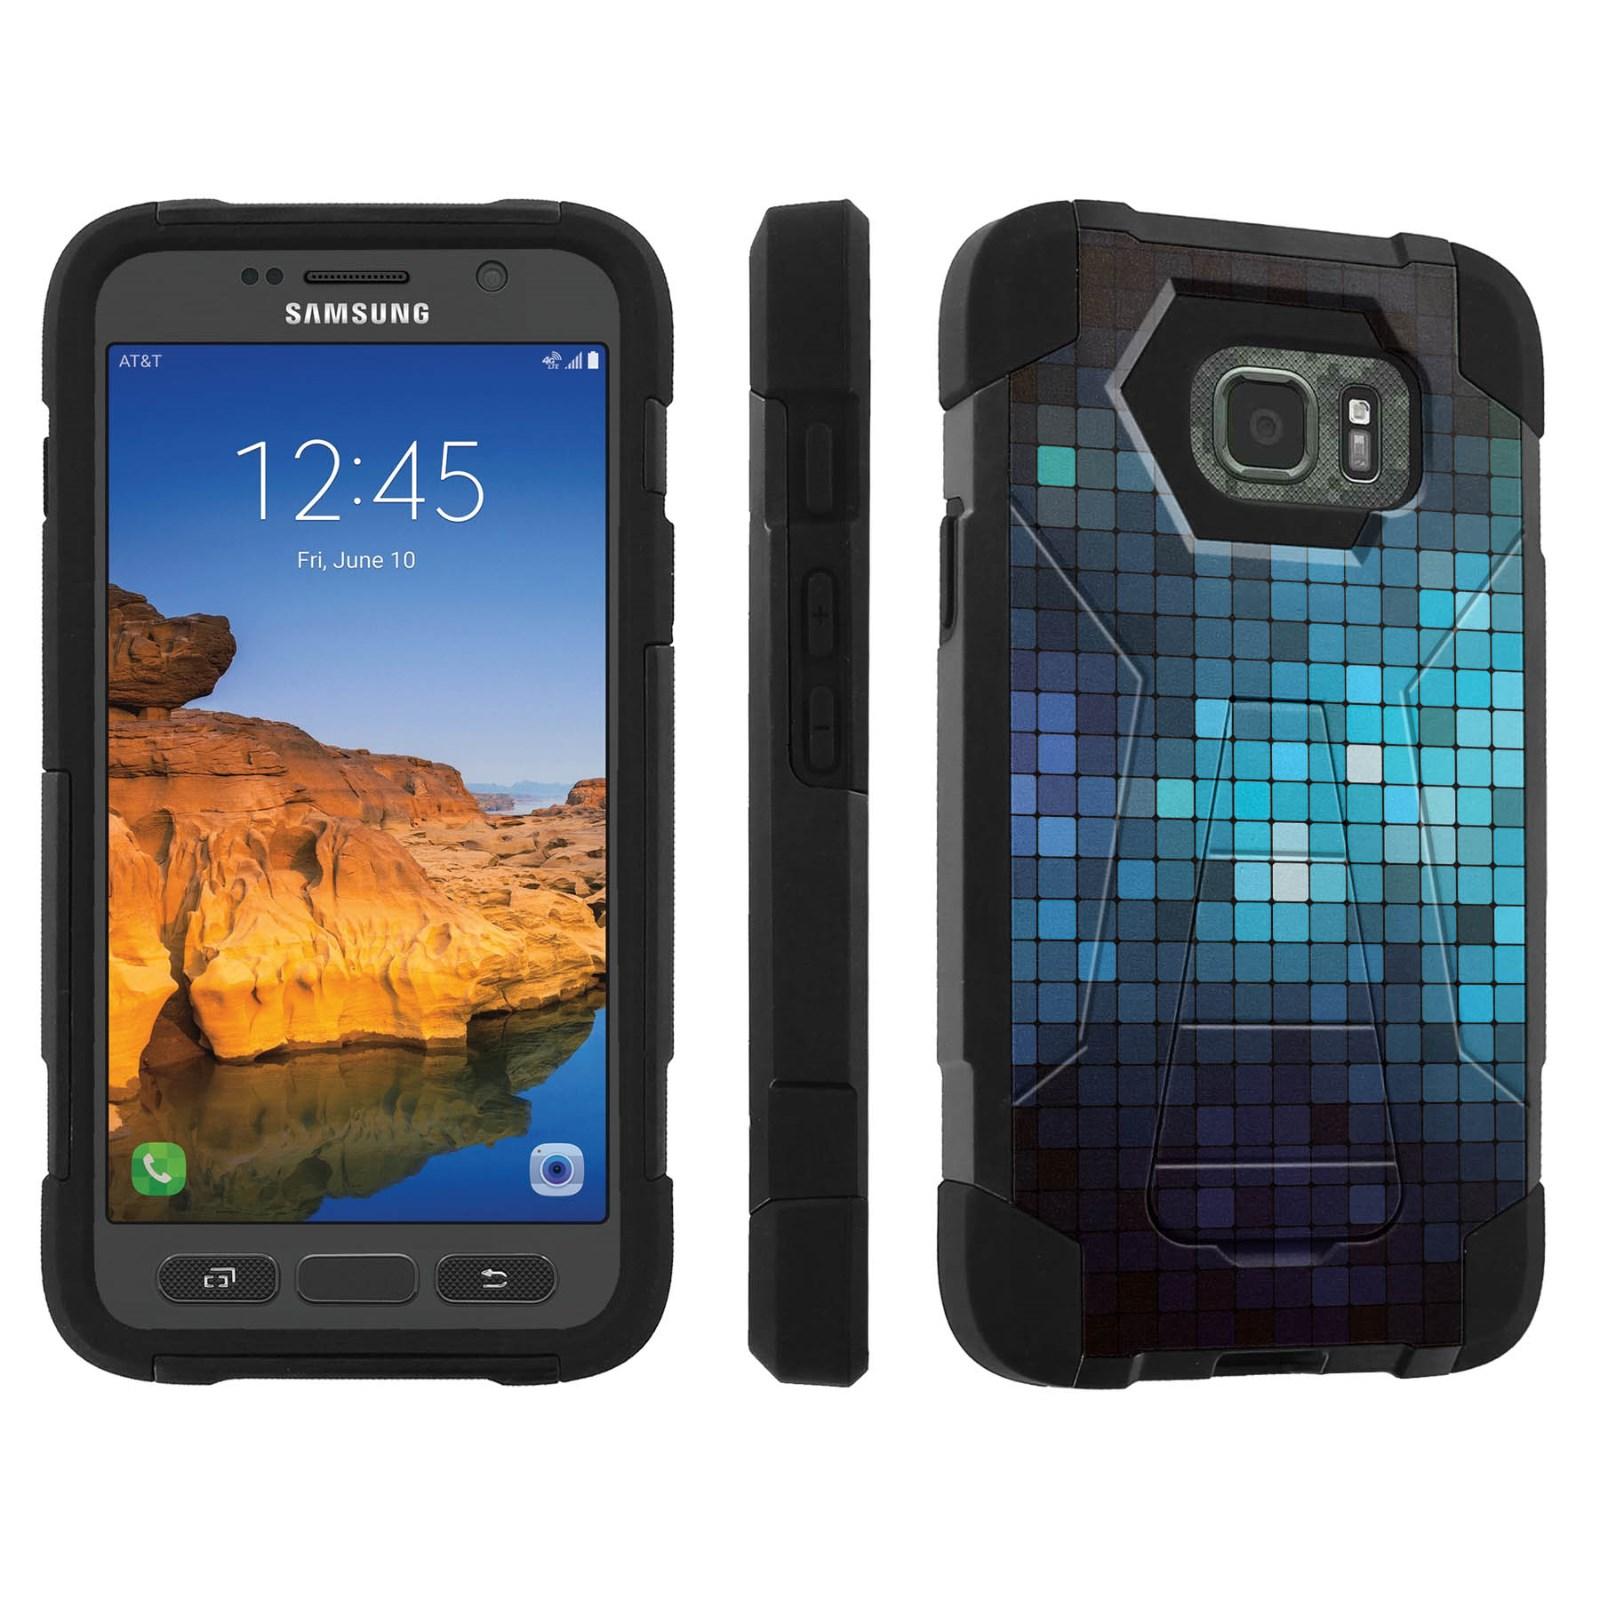 spigen black samsung ebay rugged case desc itm armor phone edge galaxy rug